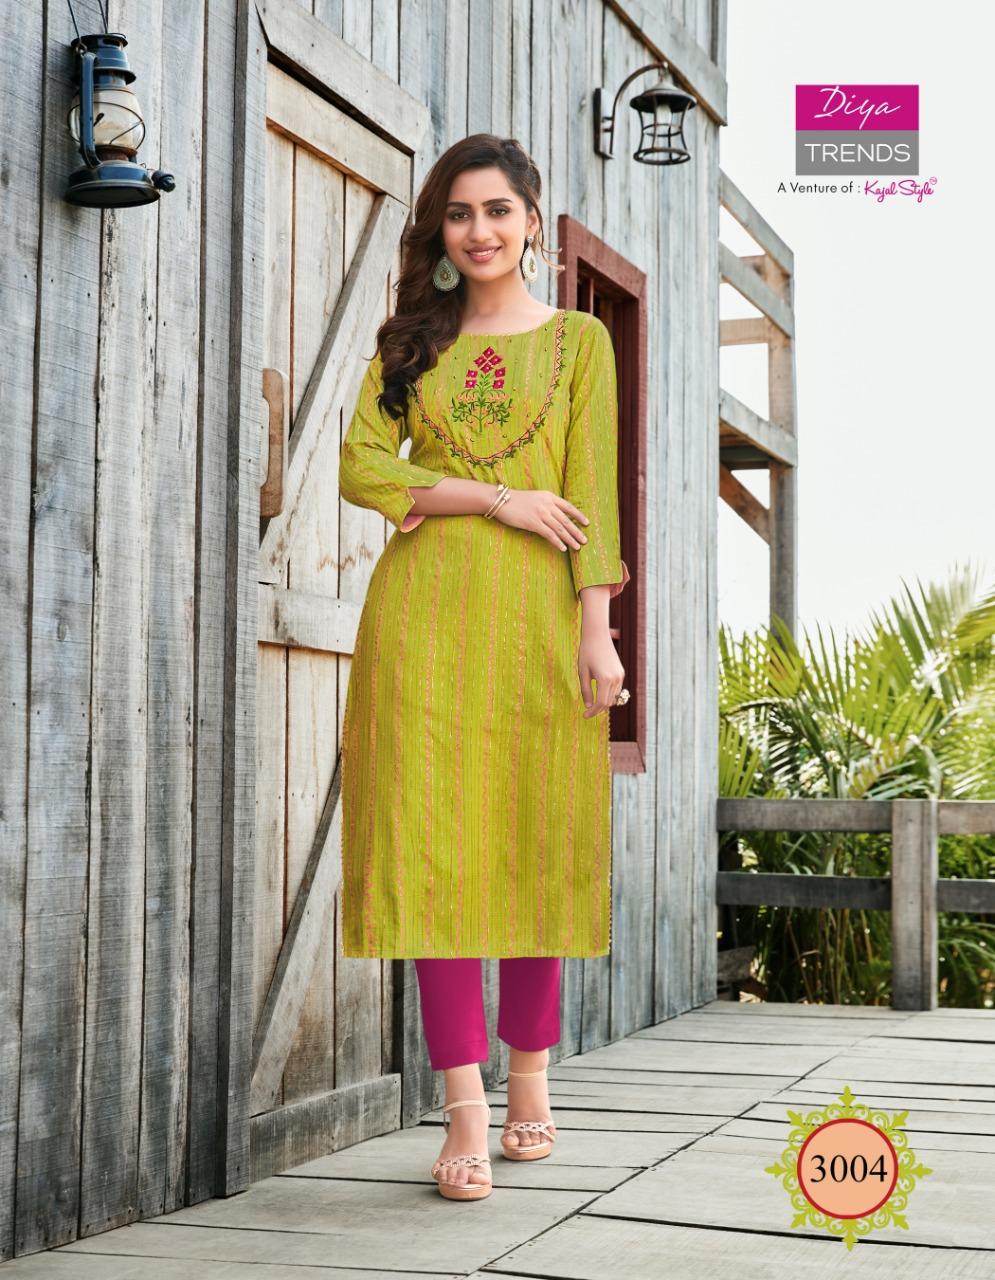 Diya Trends Victoria Vol 3 by Kajal Style Kurti Wholesale Catalog 12 Pcs 6 - Diya Trends Victoria Vol 3 by Kajal Style Kurti Wholesale Catalog 12 Pcs